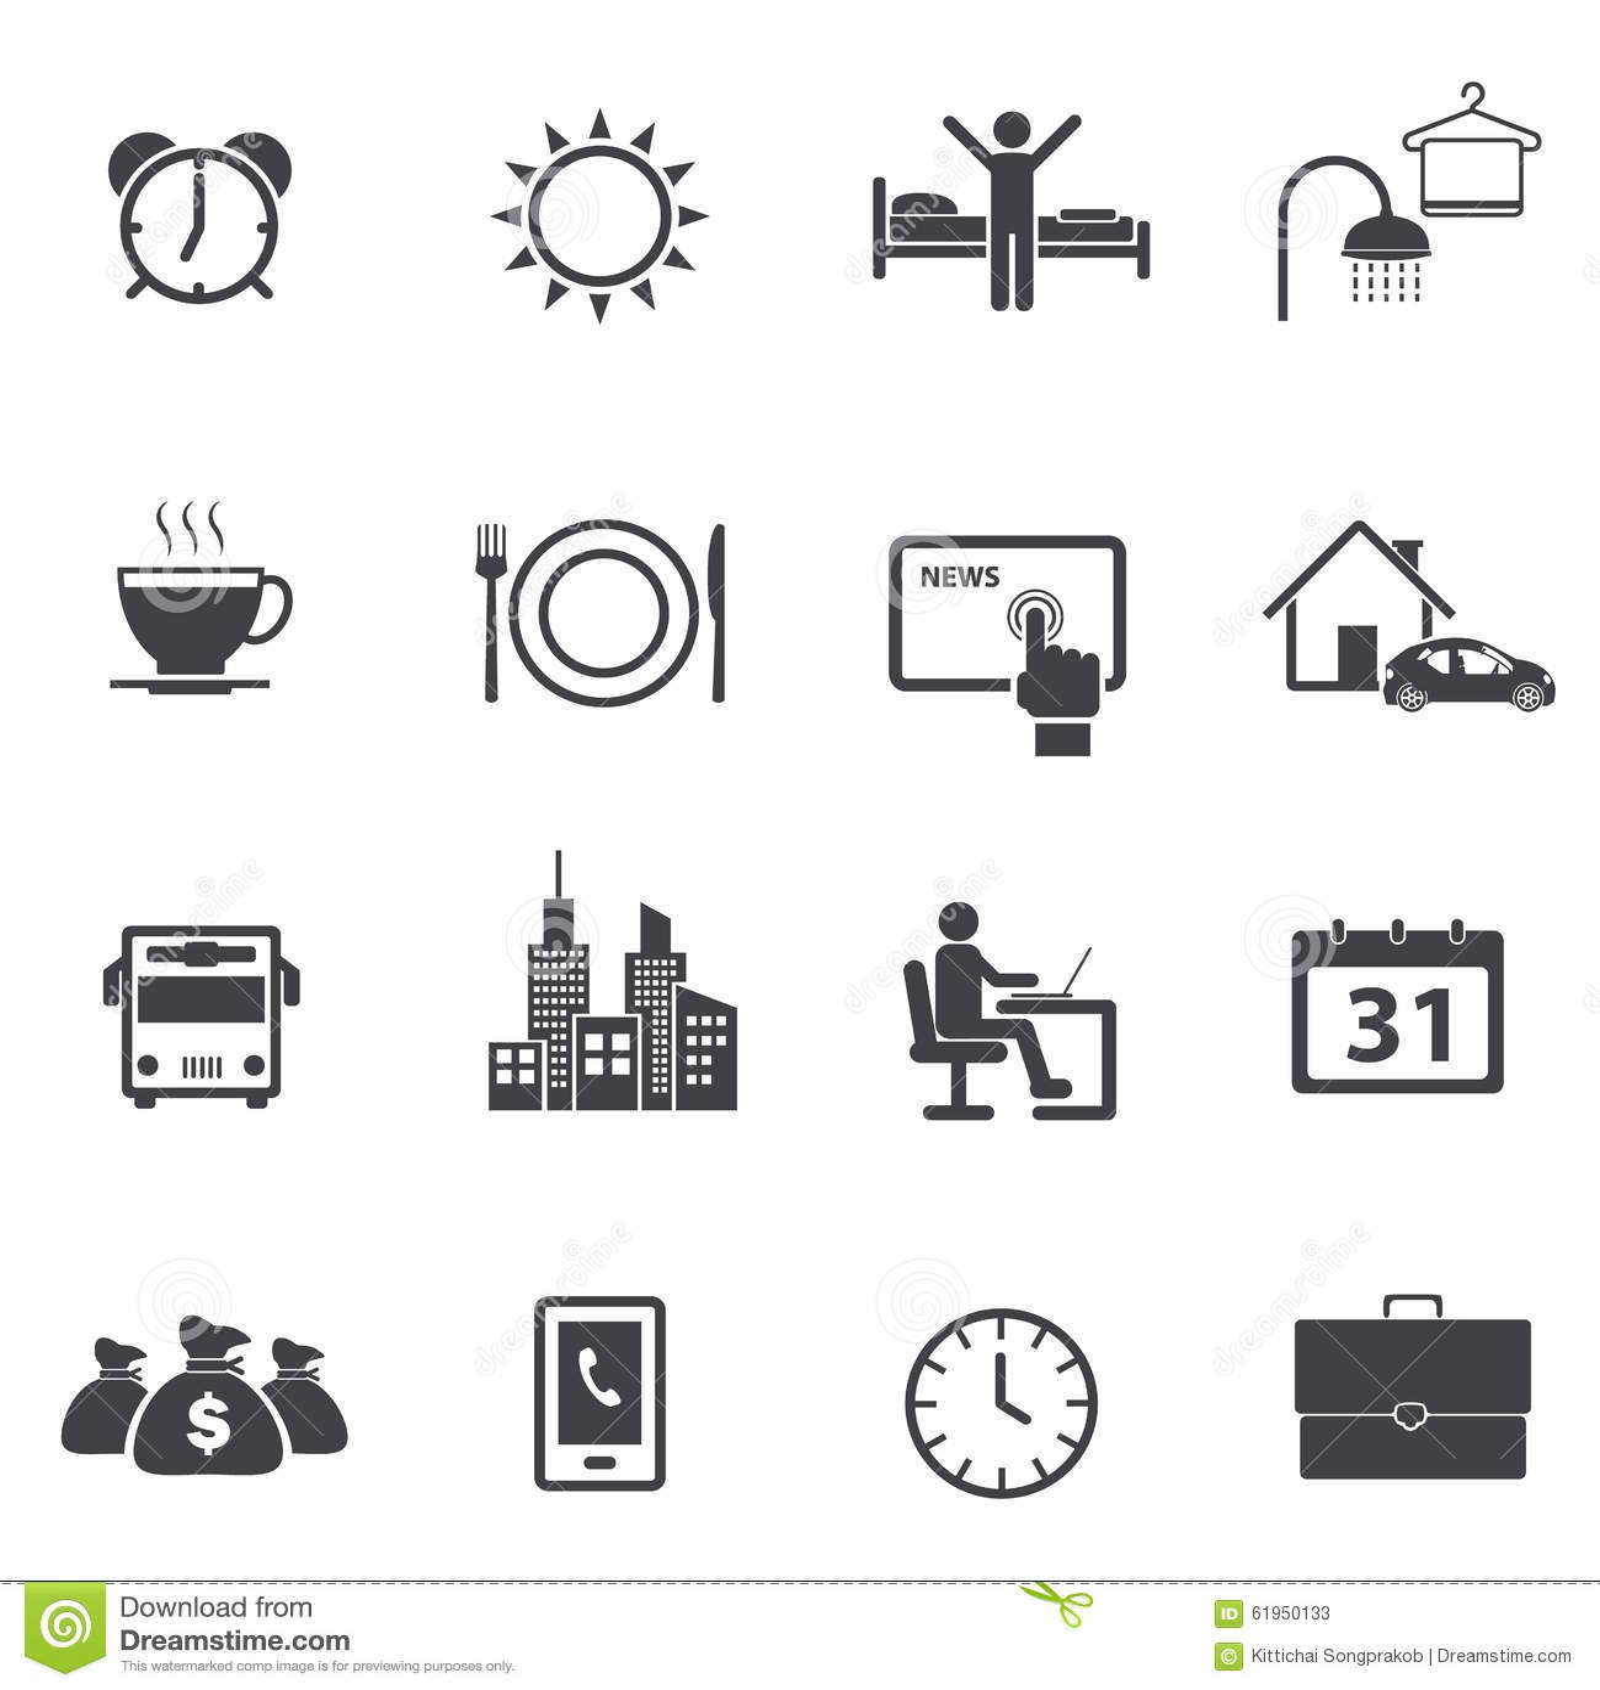 Activity Daily Routine Icons Set Stock Photo